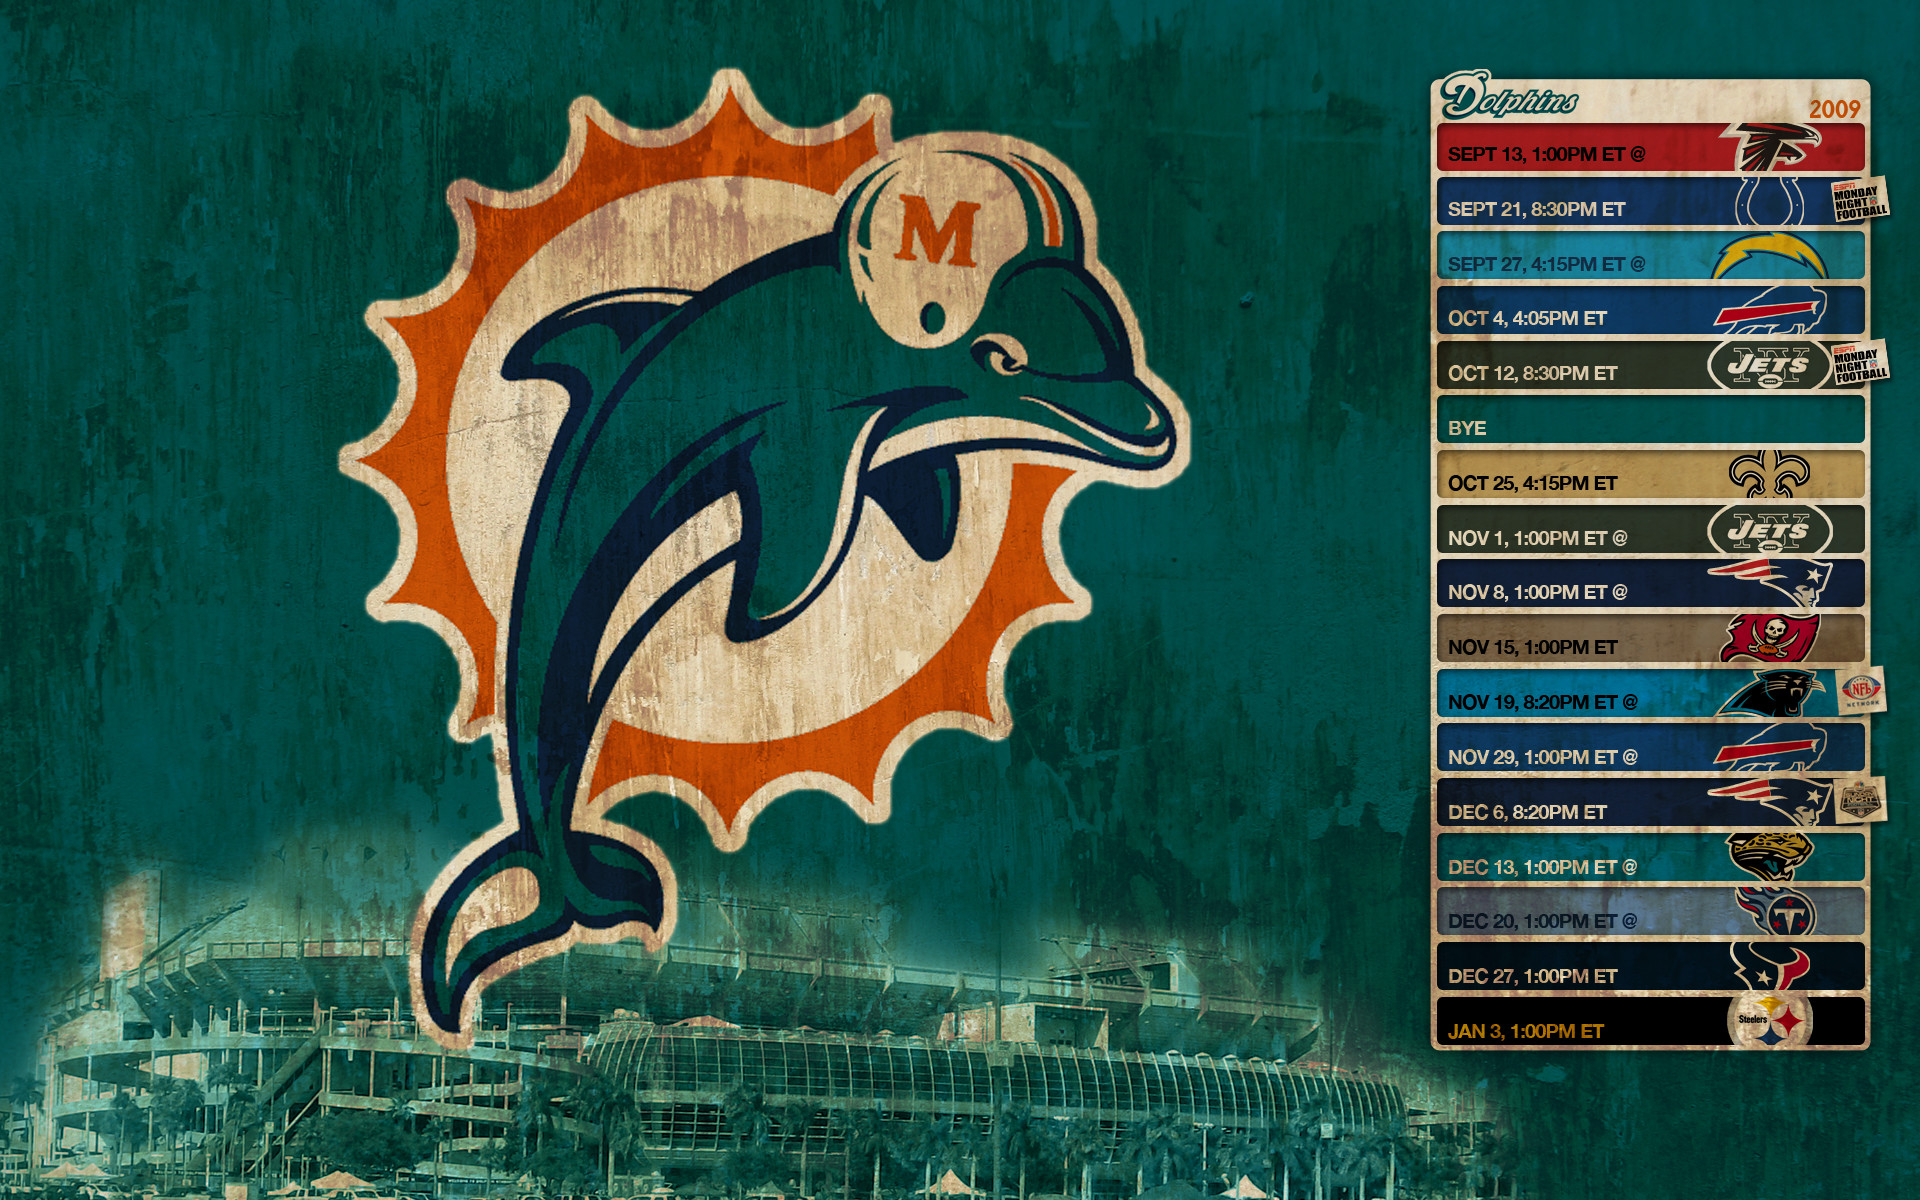 Miami Dolphins Wallpaper HD Wallpaper 1080p